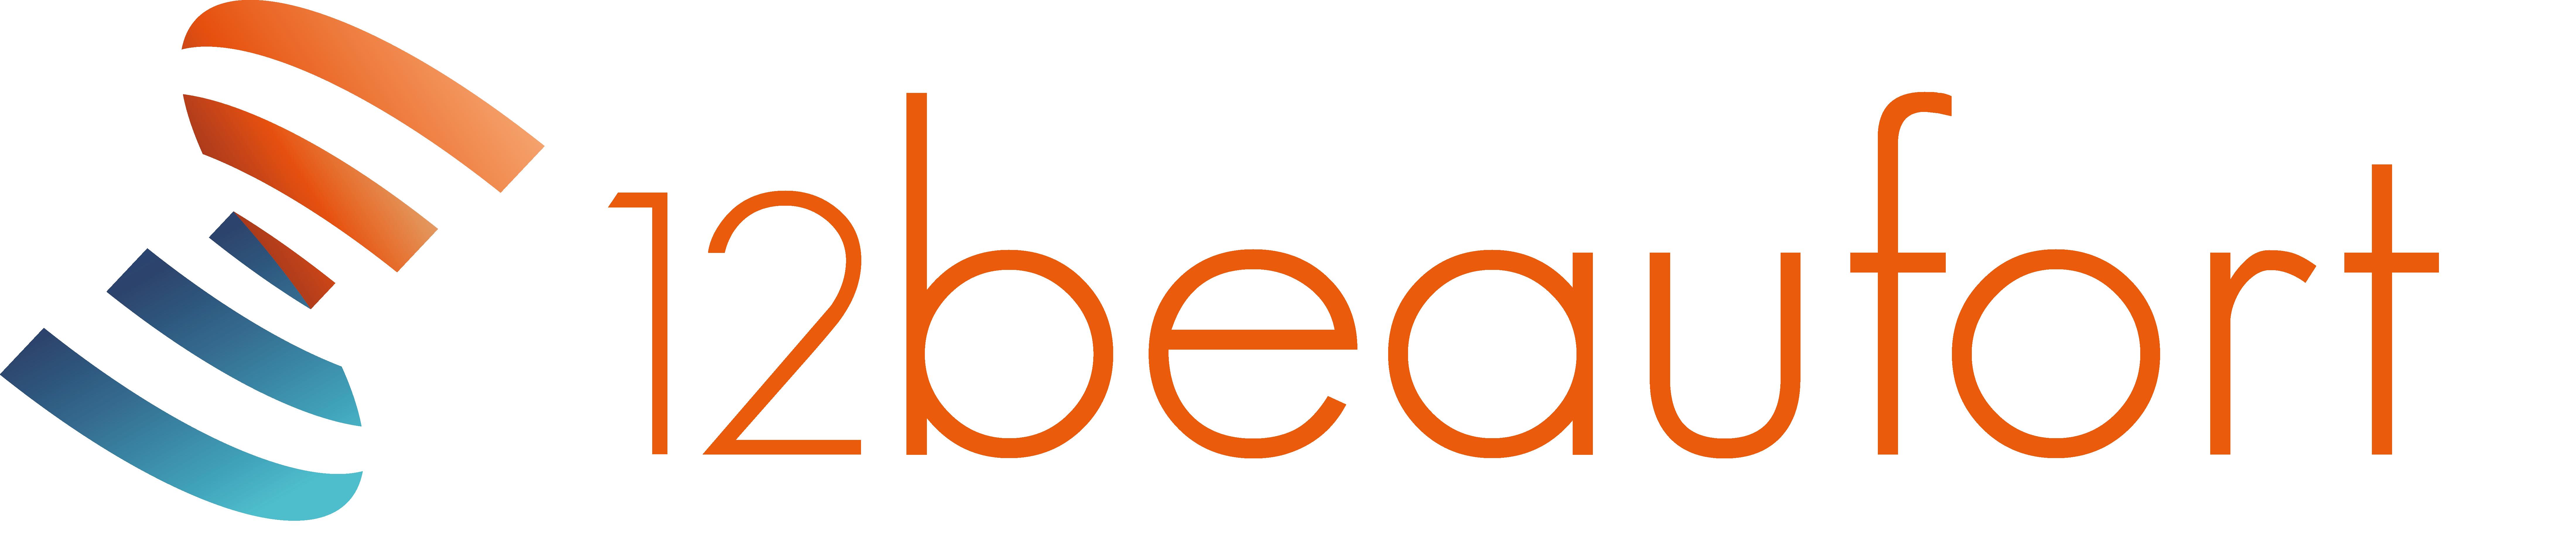 Naam en logo